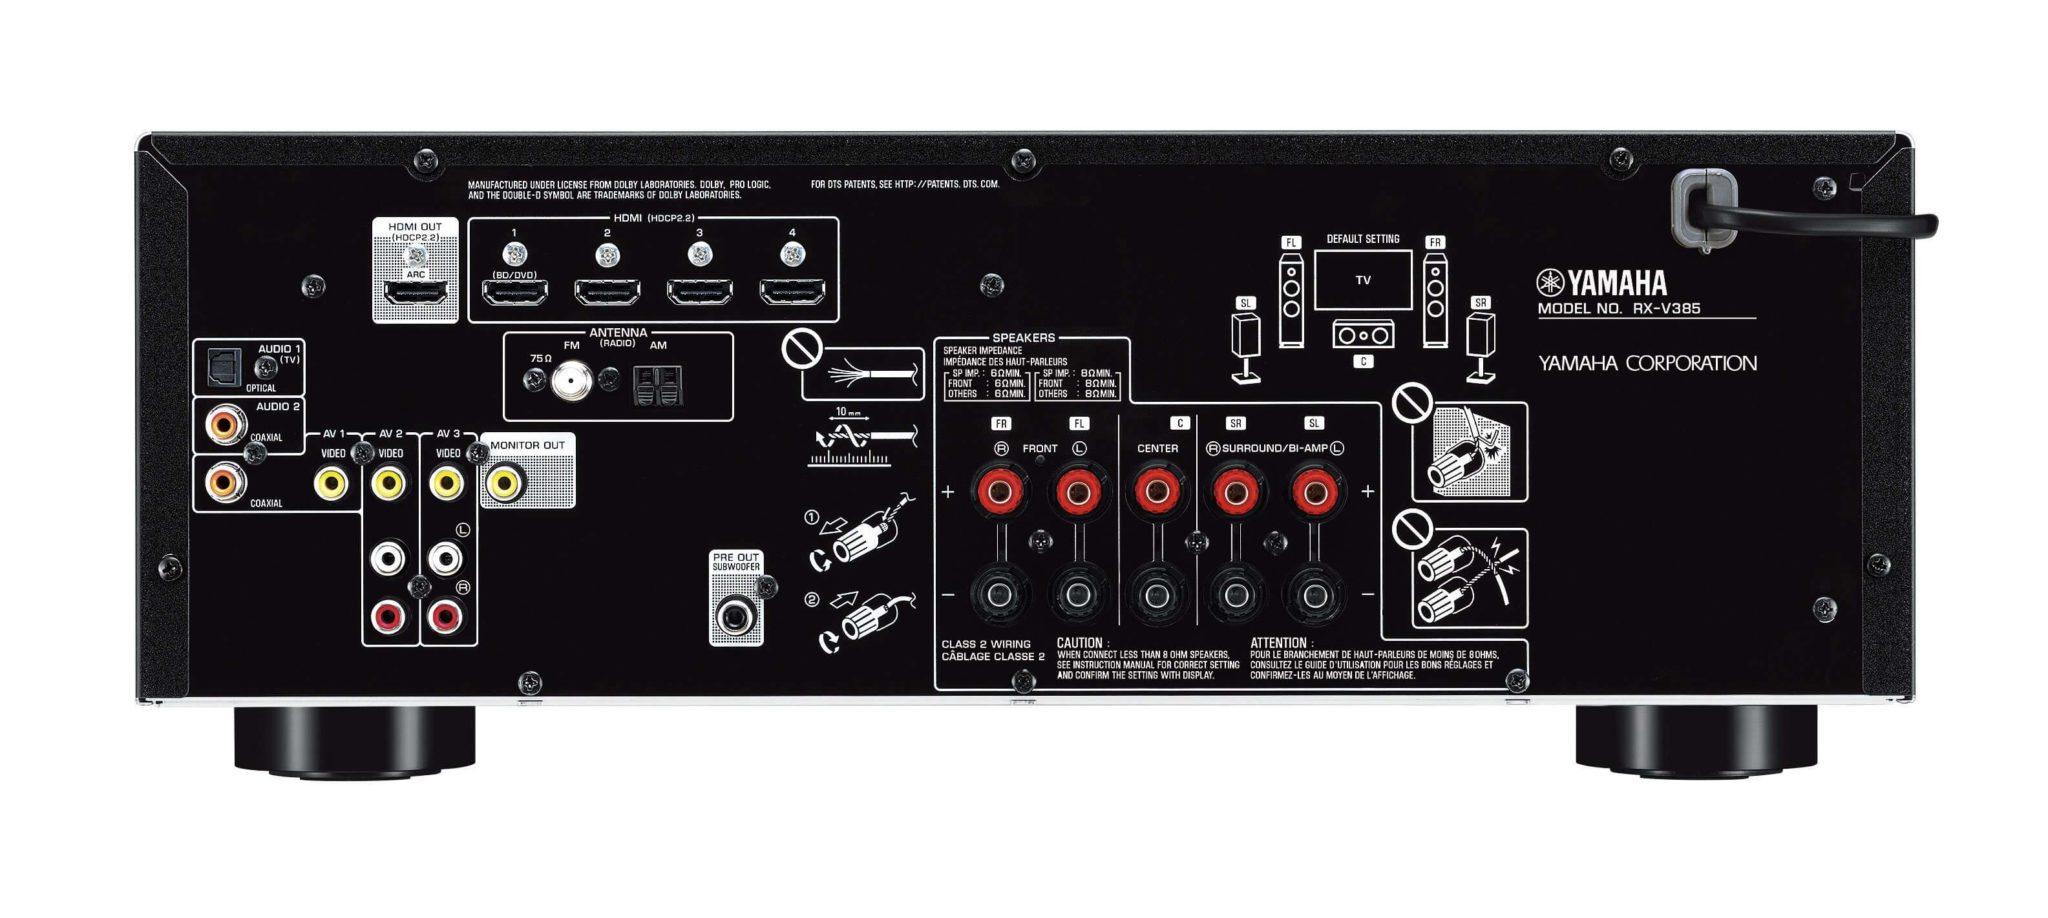 yamaha rx v385 5 1 channel av receiver gary anderson. Black Bedroom Furniture Sets. Home Design Ideas